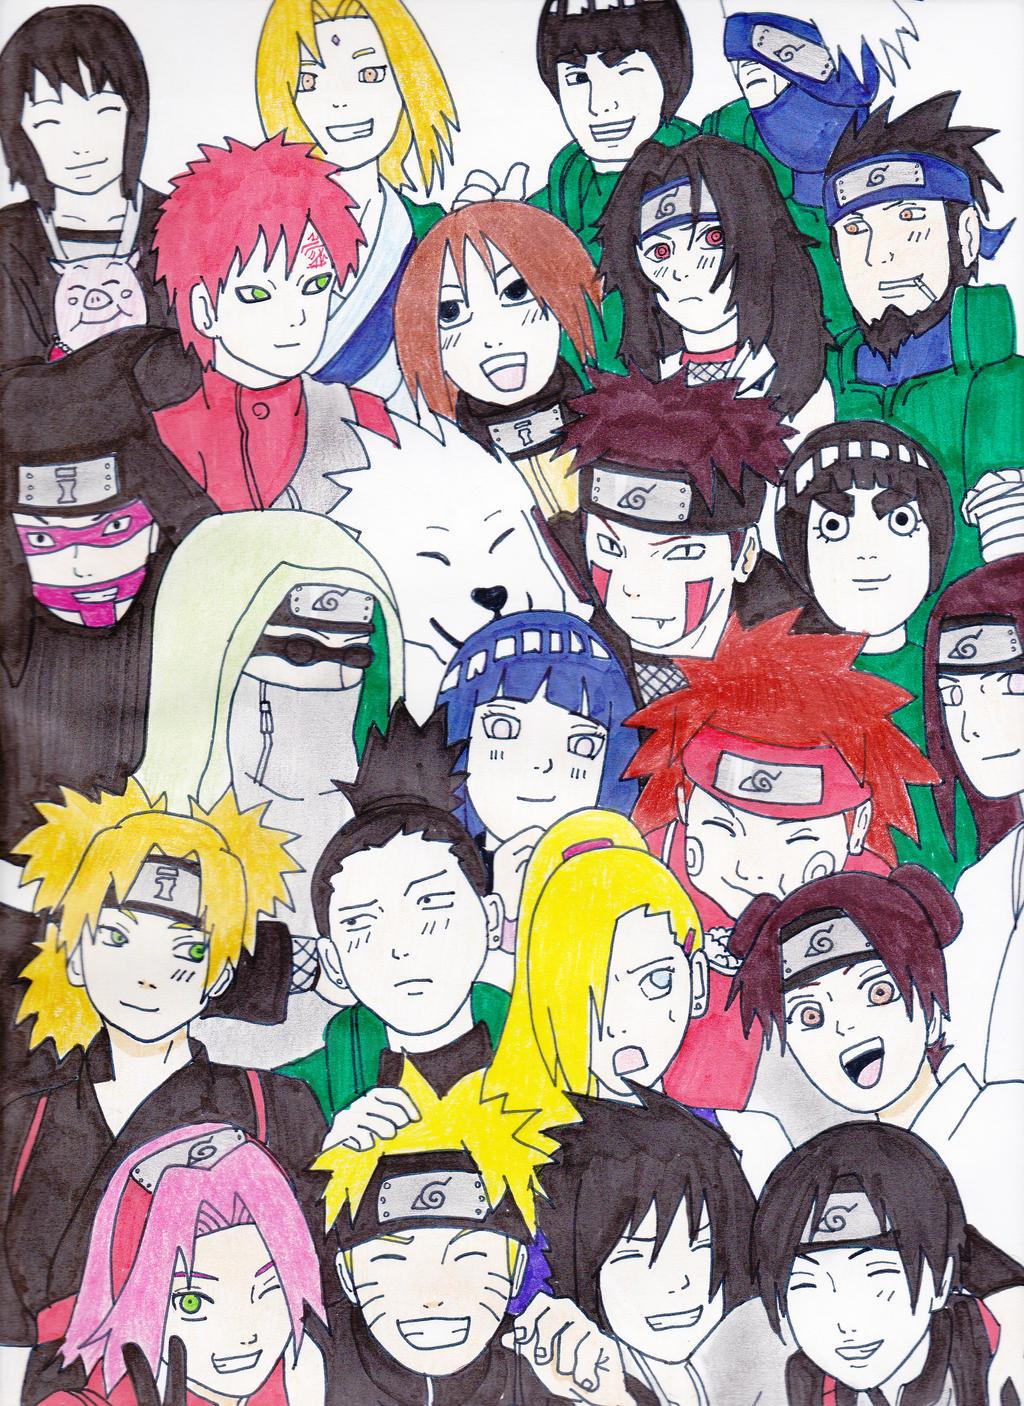 Naruto Shippuden Characters by kekegenkai1 on DeviantArt